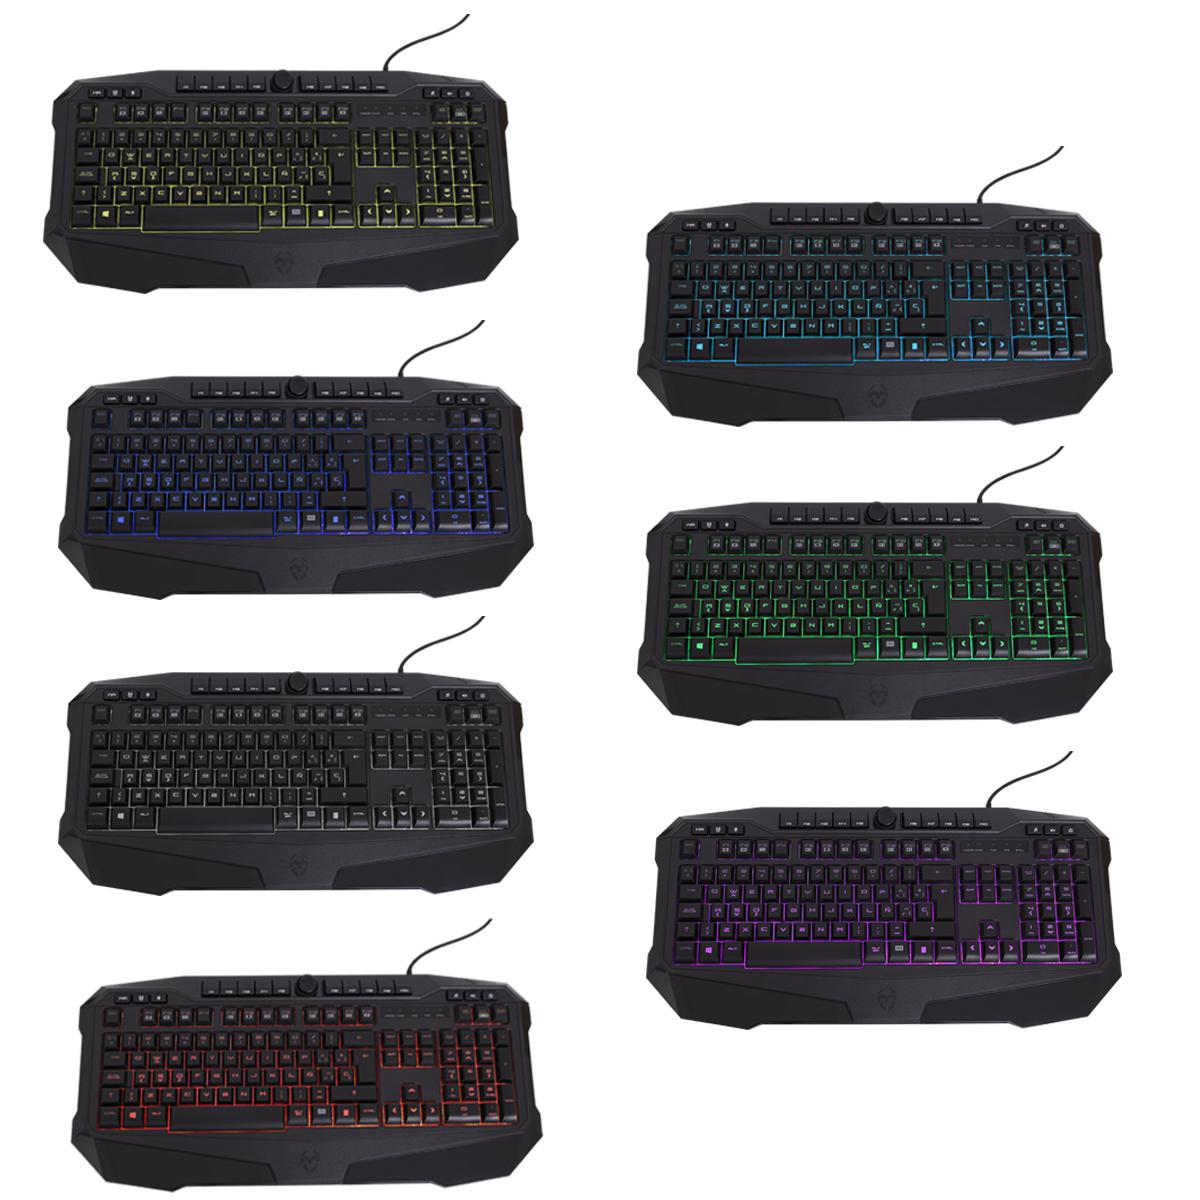 Krom Khalon Gaming Keyboard